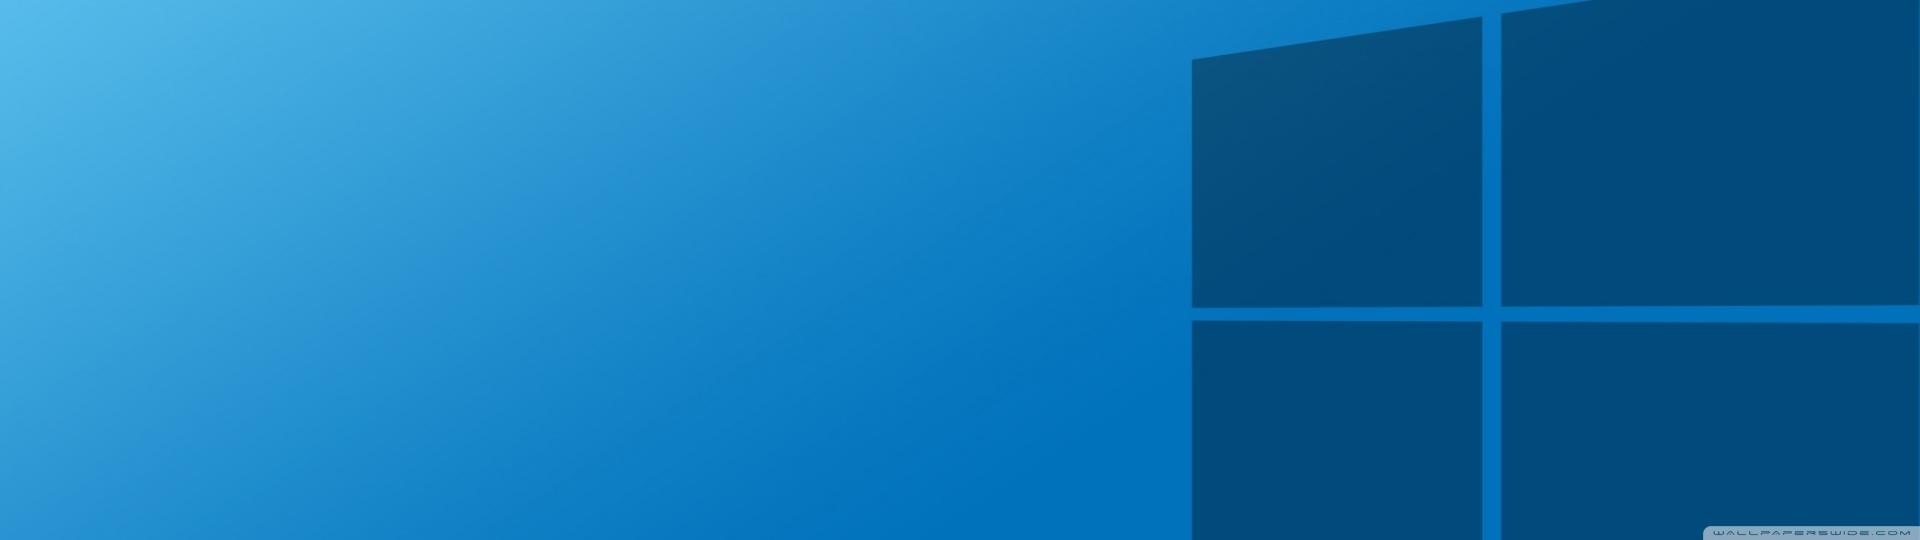 windows 10 ❤ 4k hd desktop wallpaper for • wide & ultra widescreen